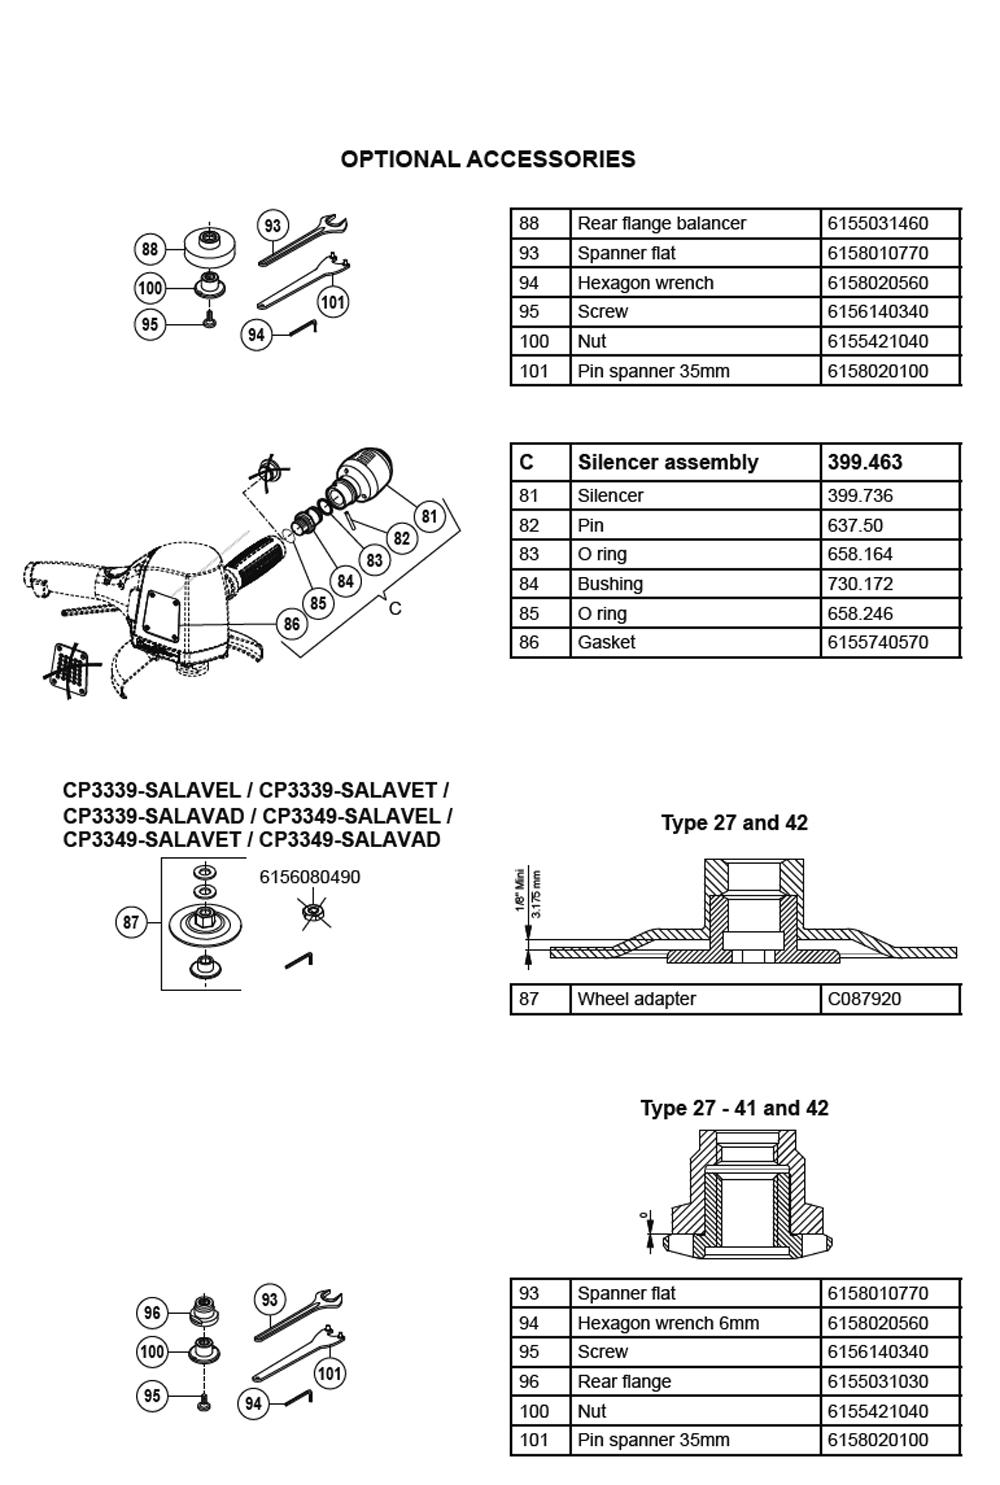 CP3349-SALAVADE-chicago-PB-7Break Down